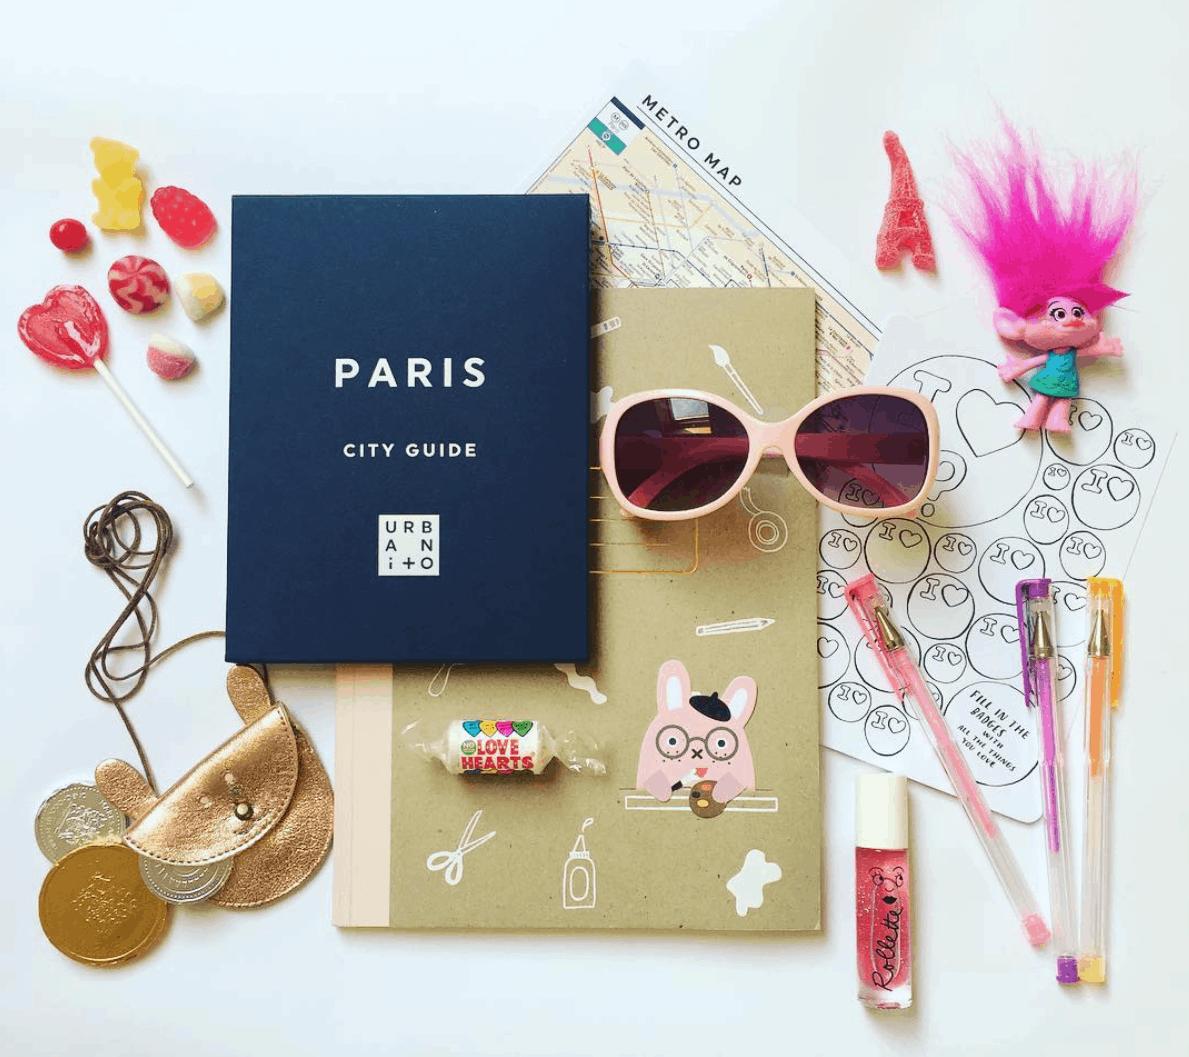 Urbanito Paris city guide